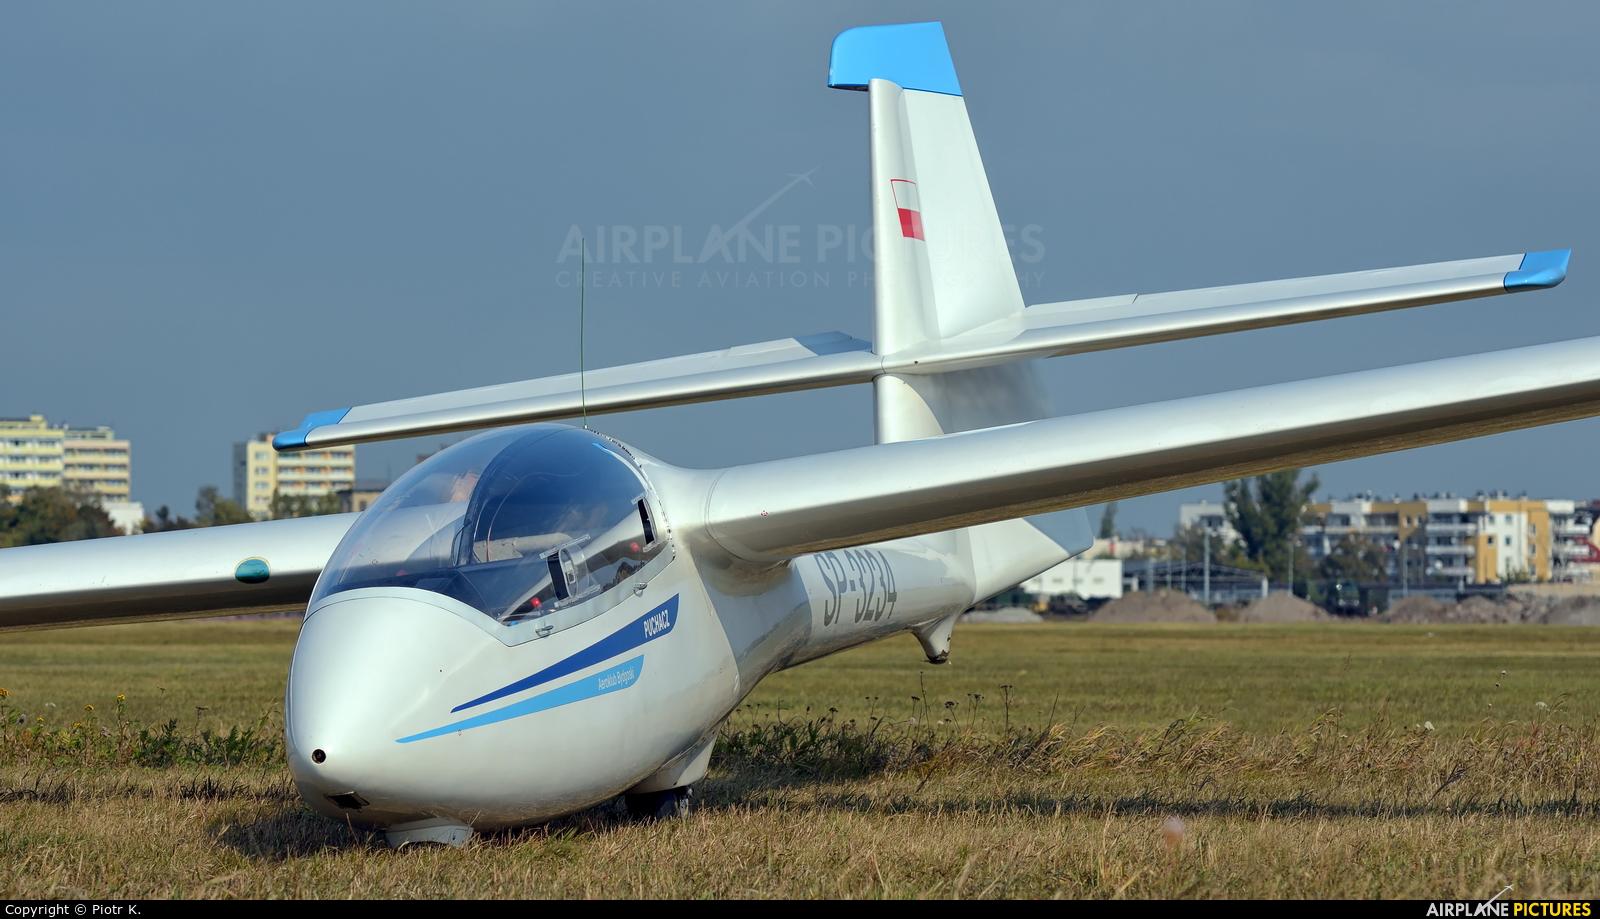 Aeroklub Bydgoski 3234 aircraft at Bydgoszcz - Szwederowo